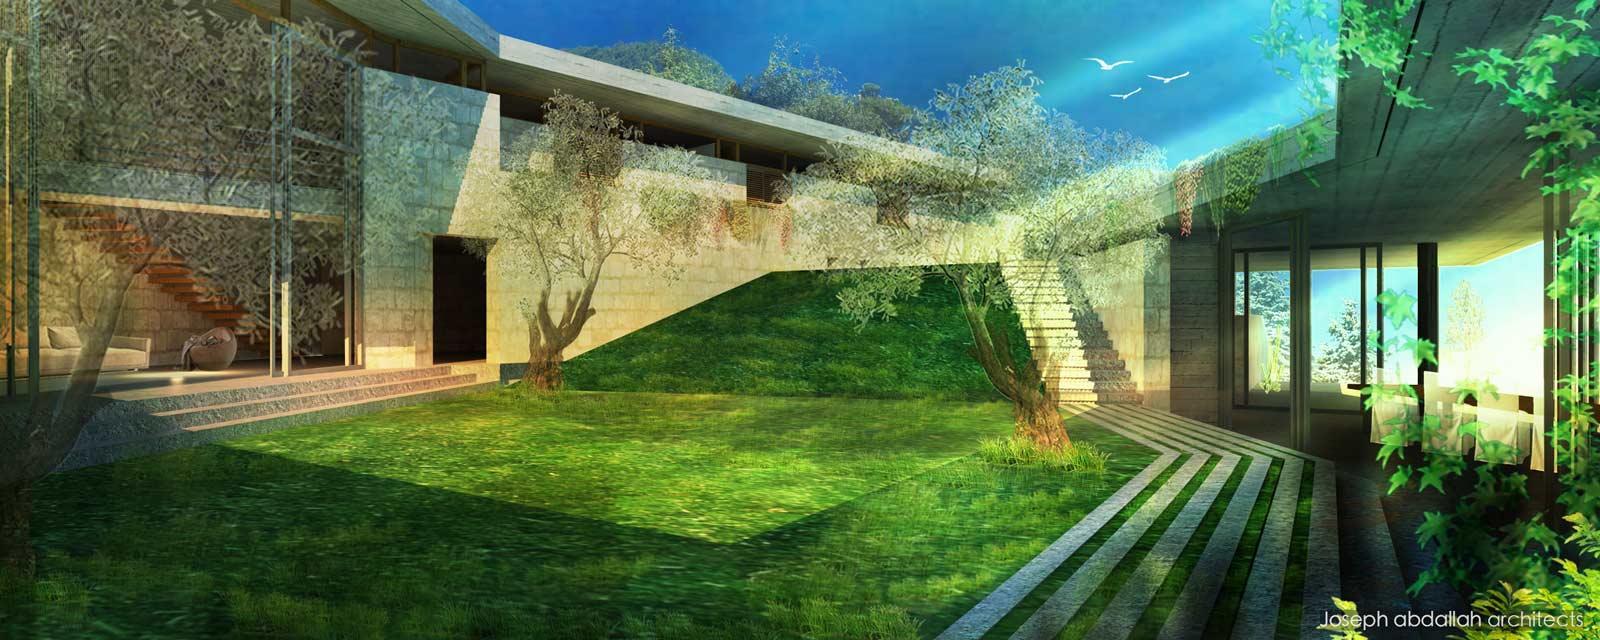 bakhos-nassif-eagle-nest-villa-lebanon-joseph-abdallah-architects-2